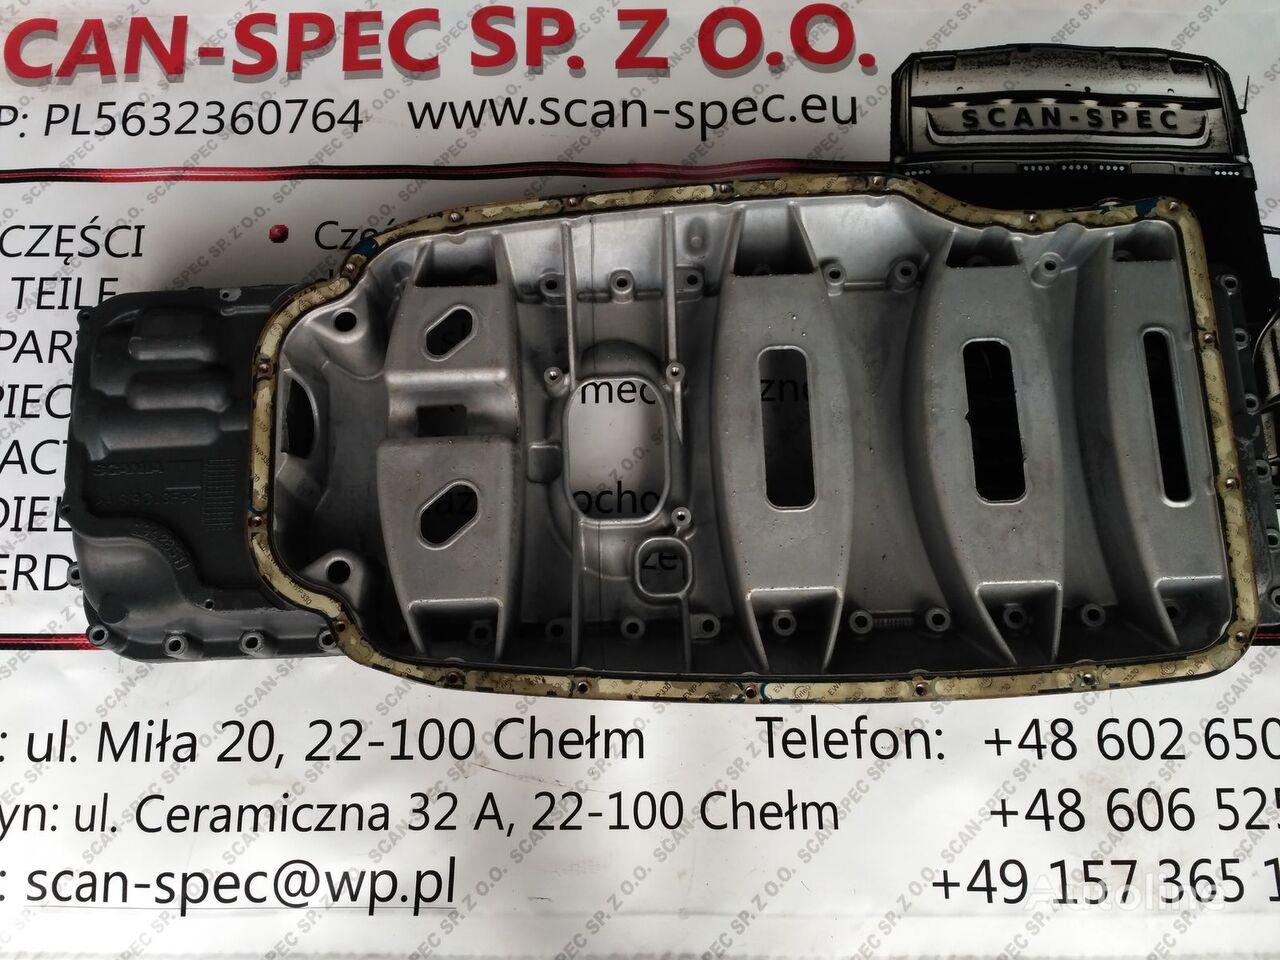 rama wałków crankcase for SCANIA P R G T tractor unit